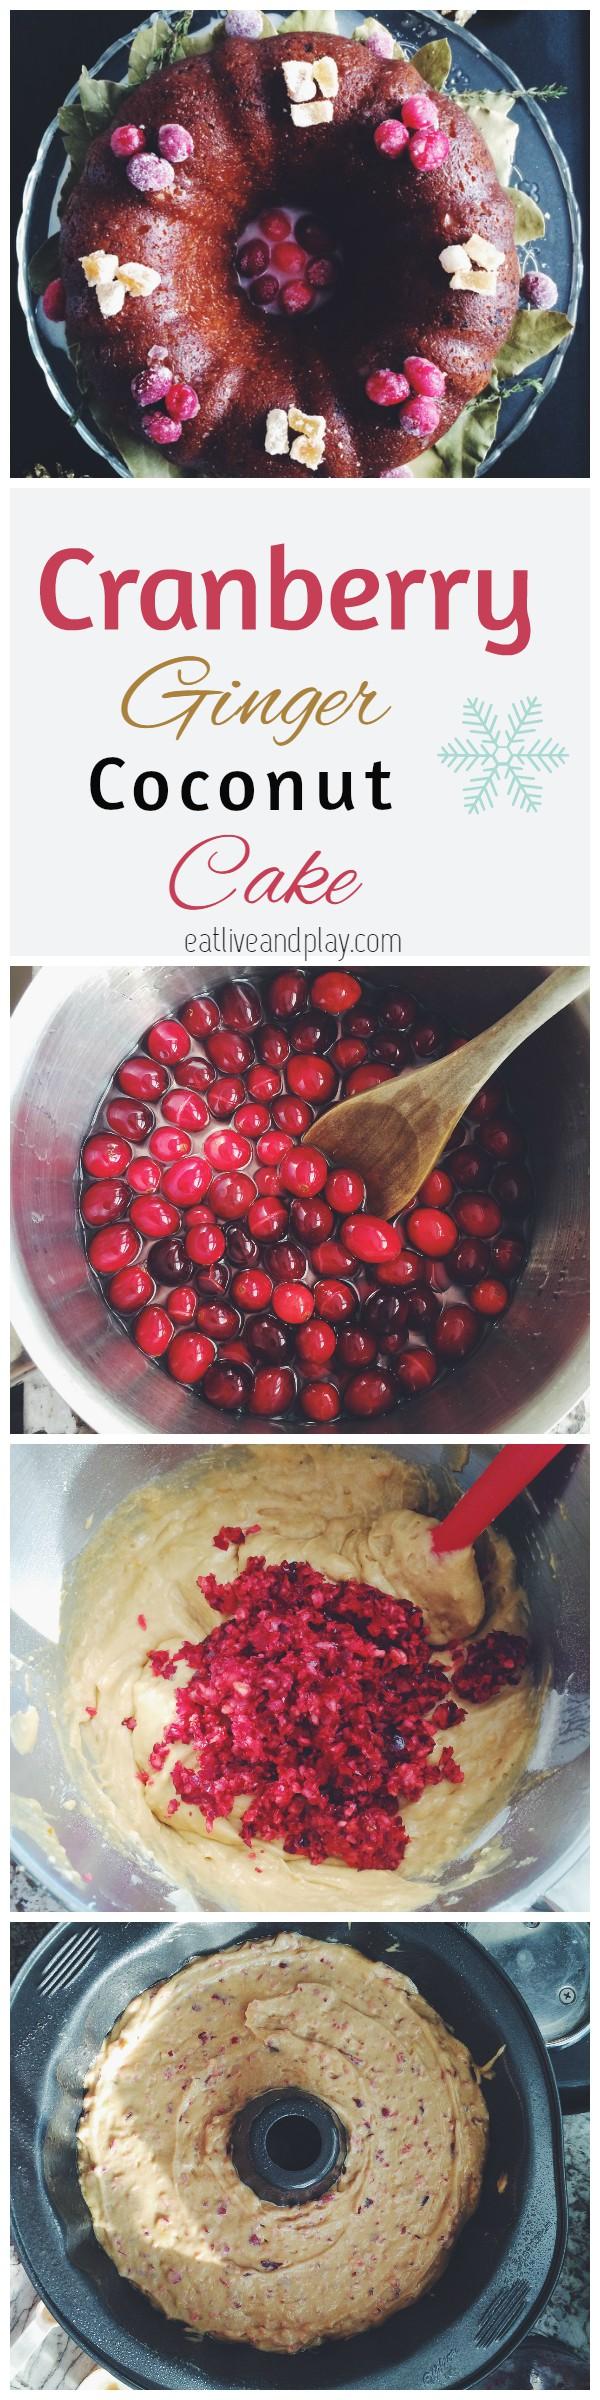 Cranberry Ginger Coconut Cake